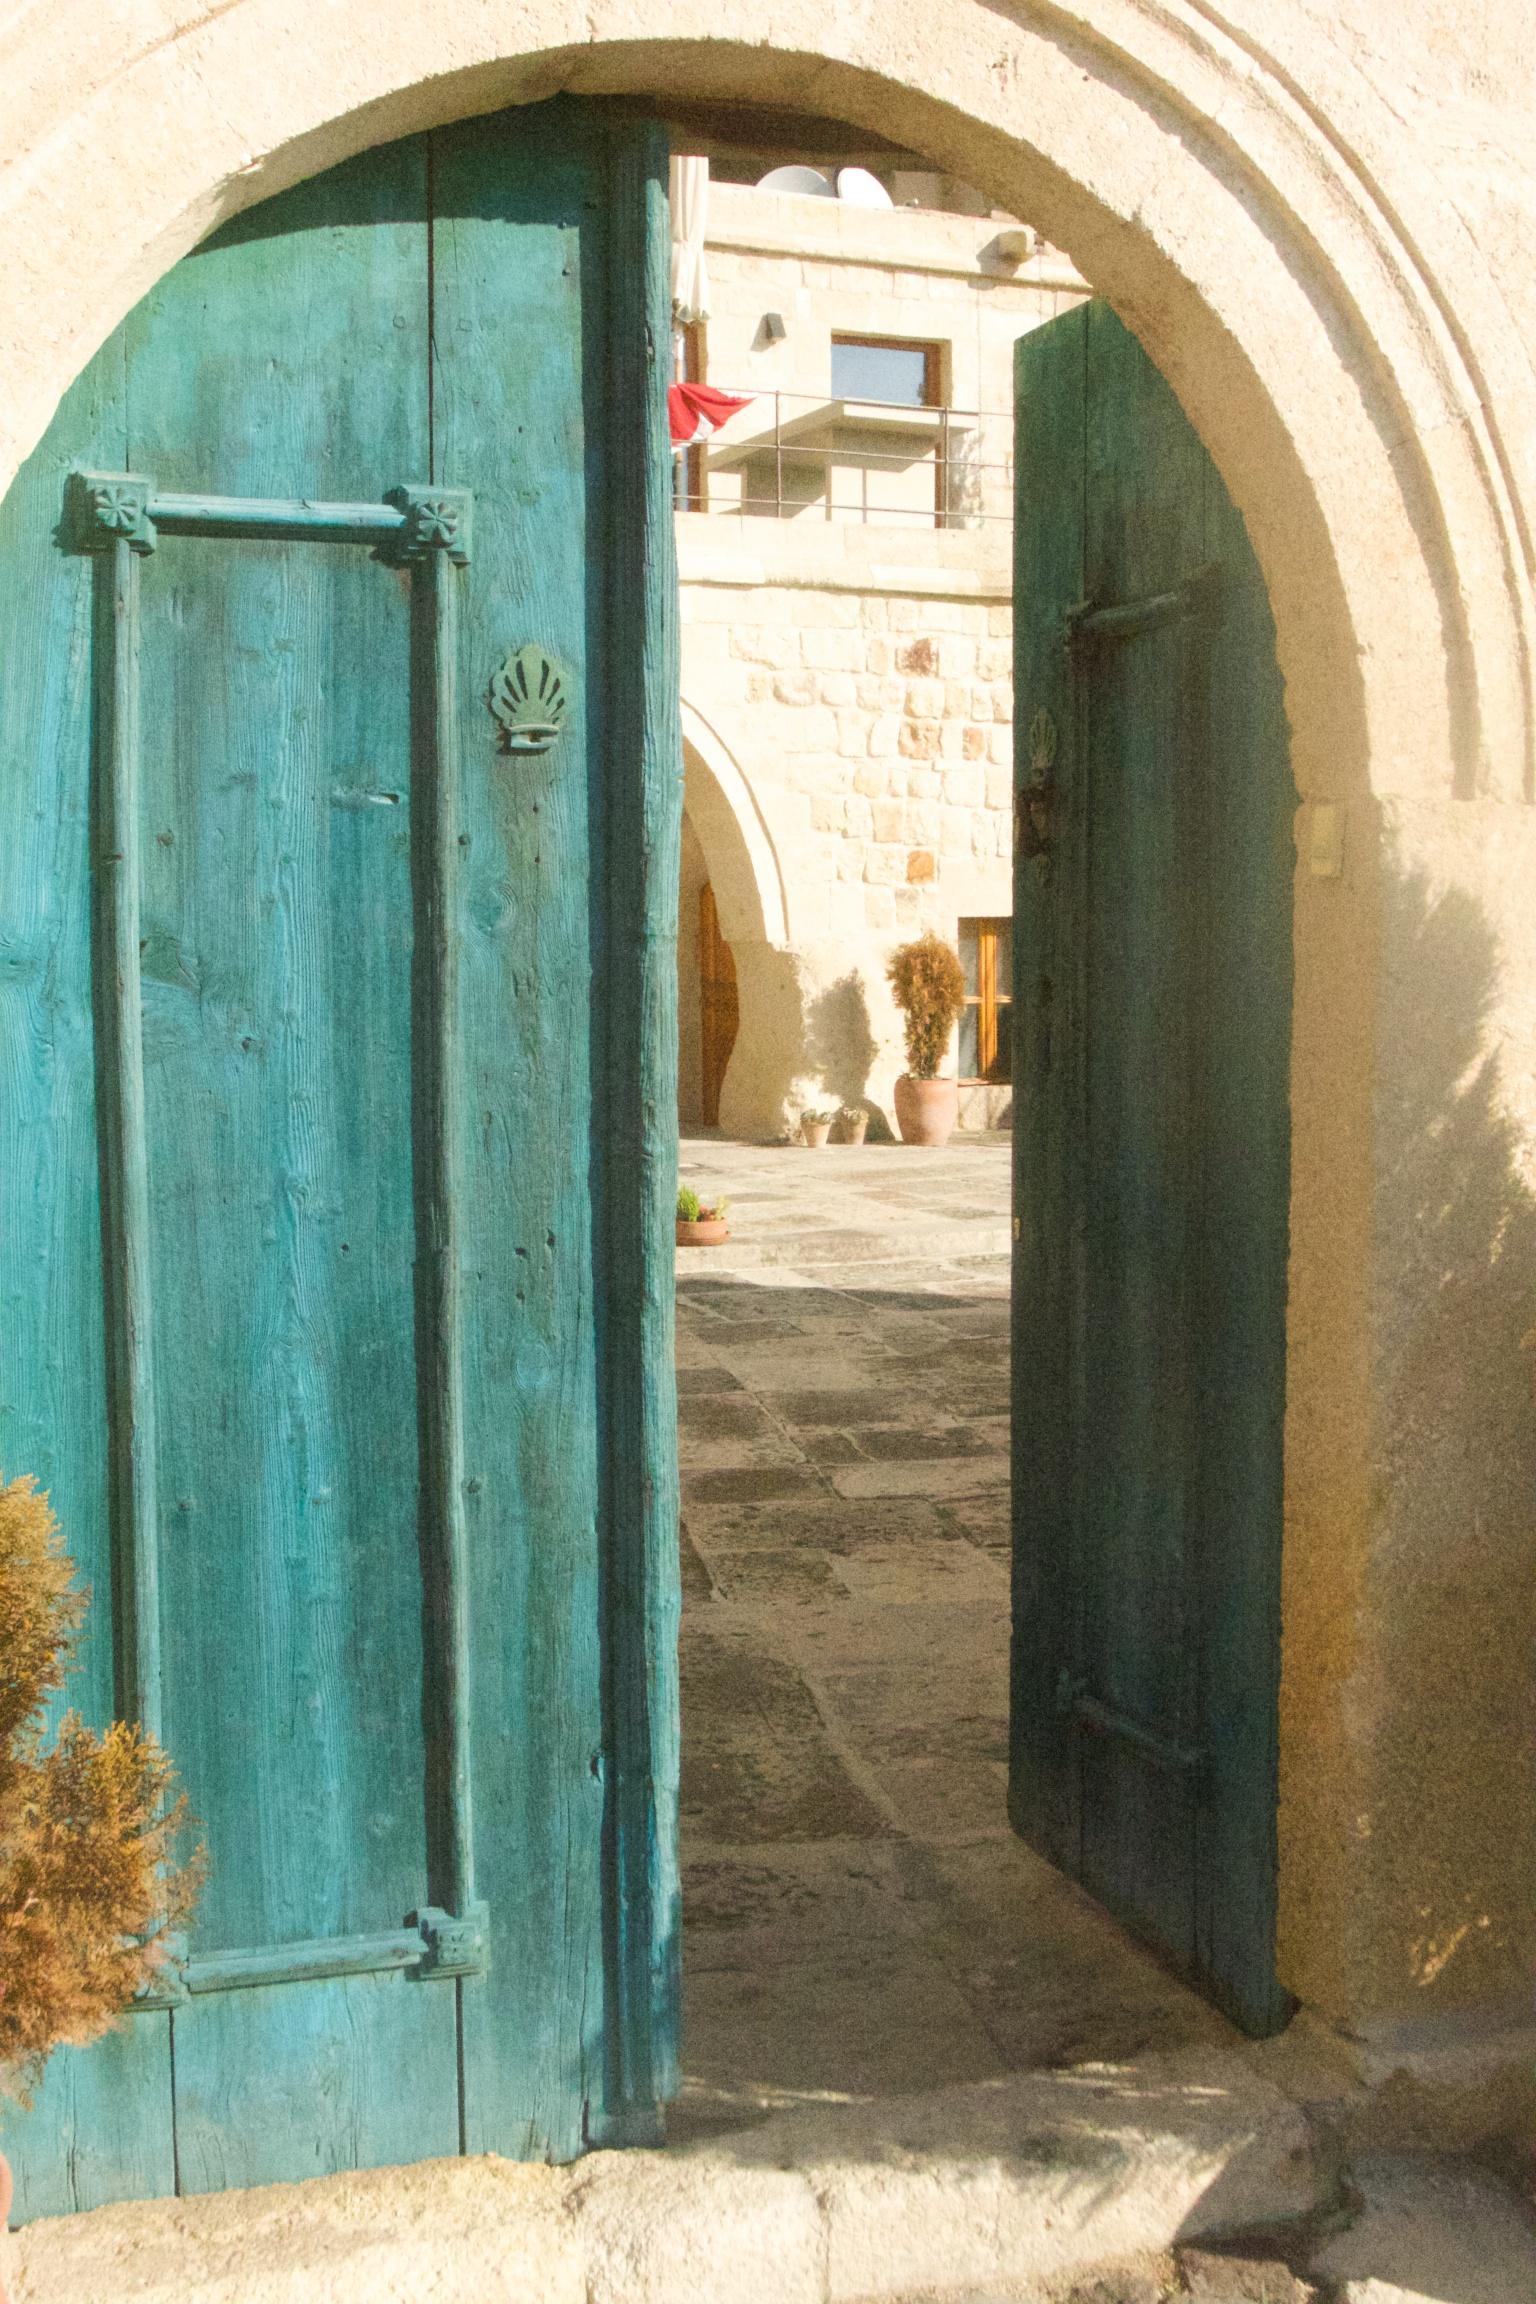 cappadocia-ontheground 1.jpg